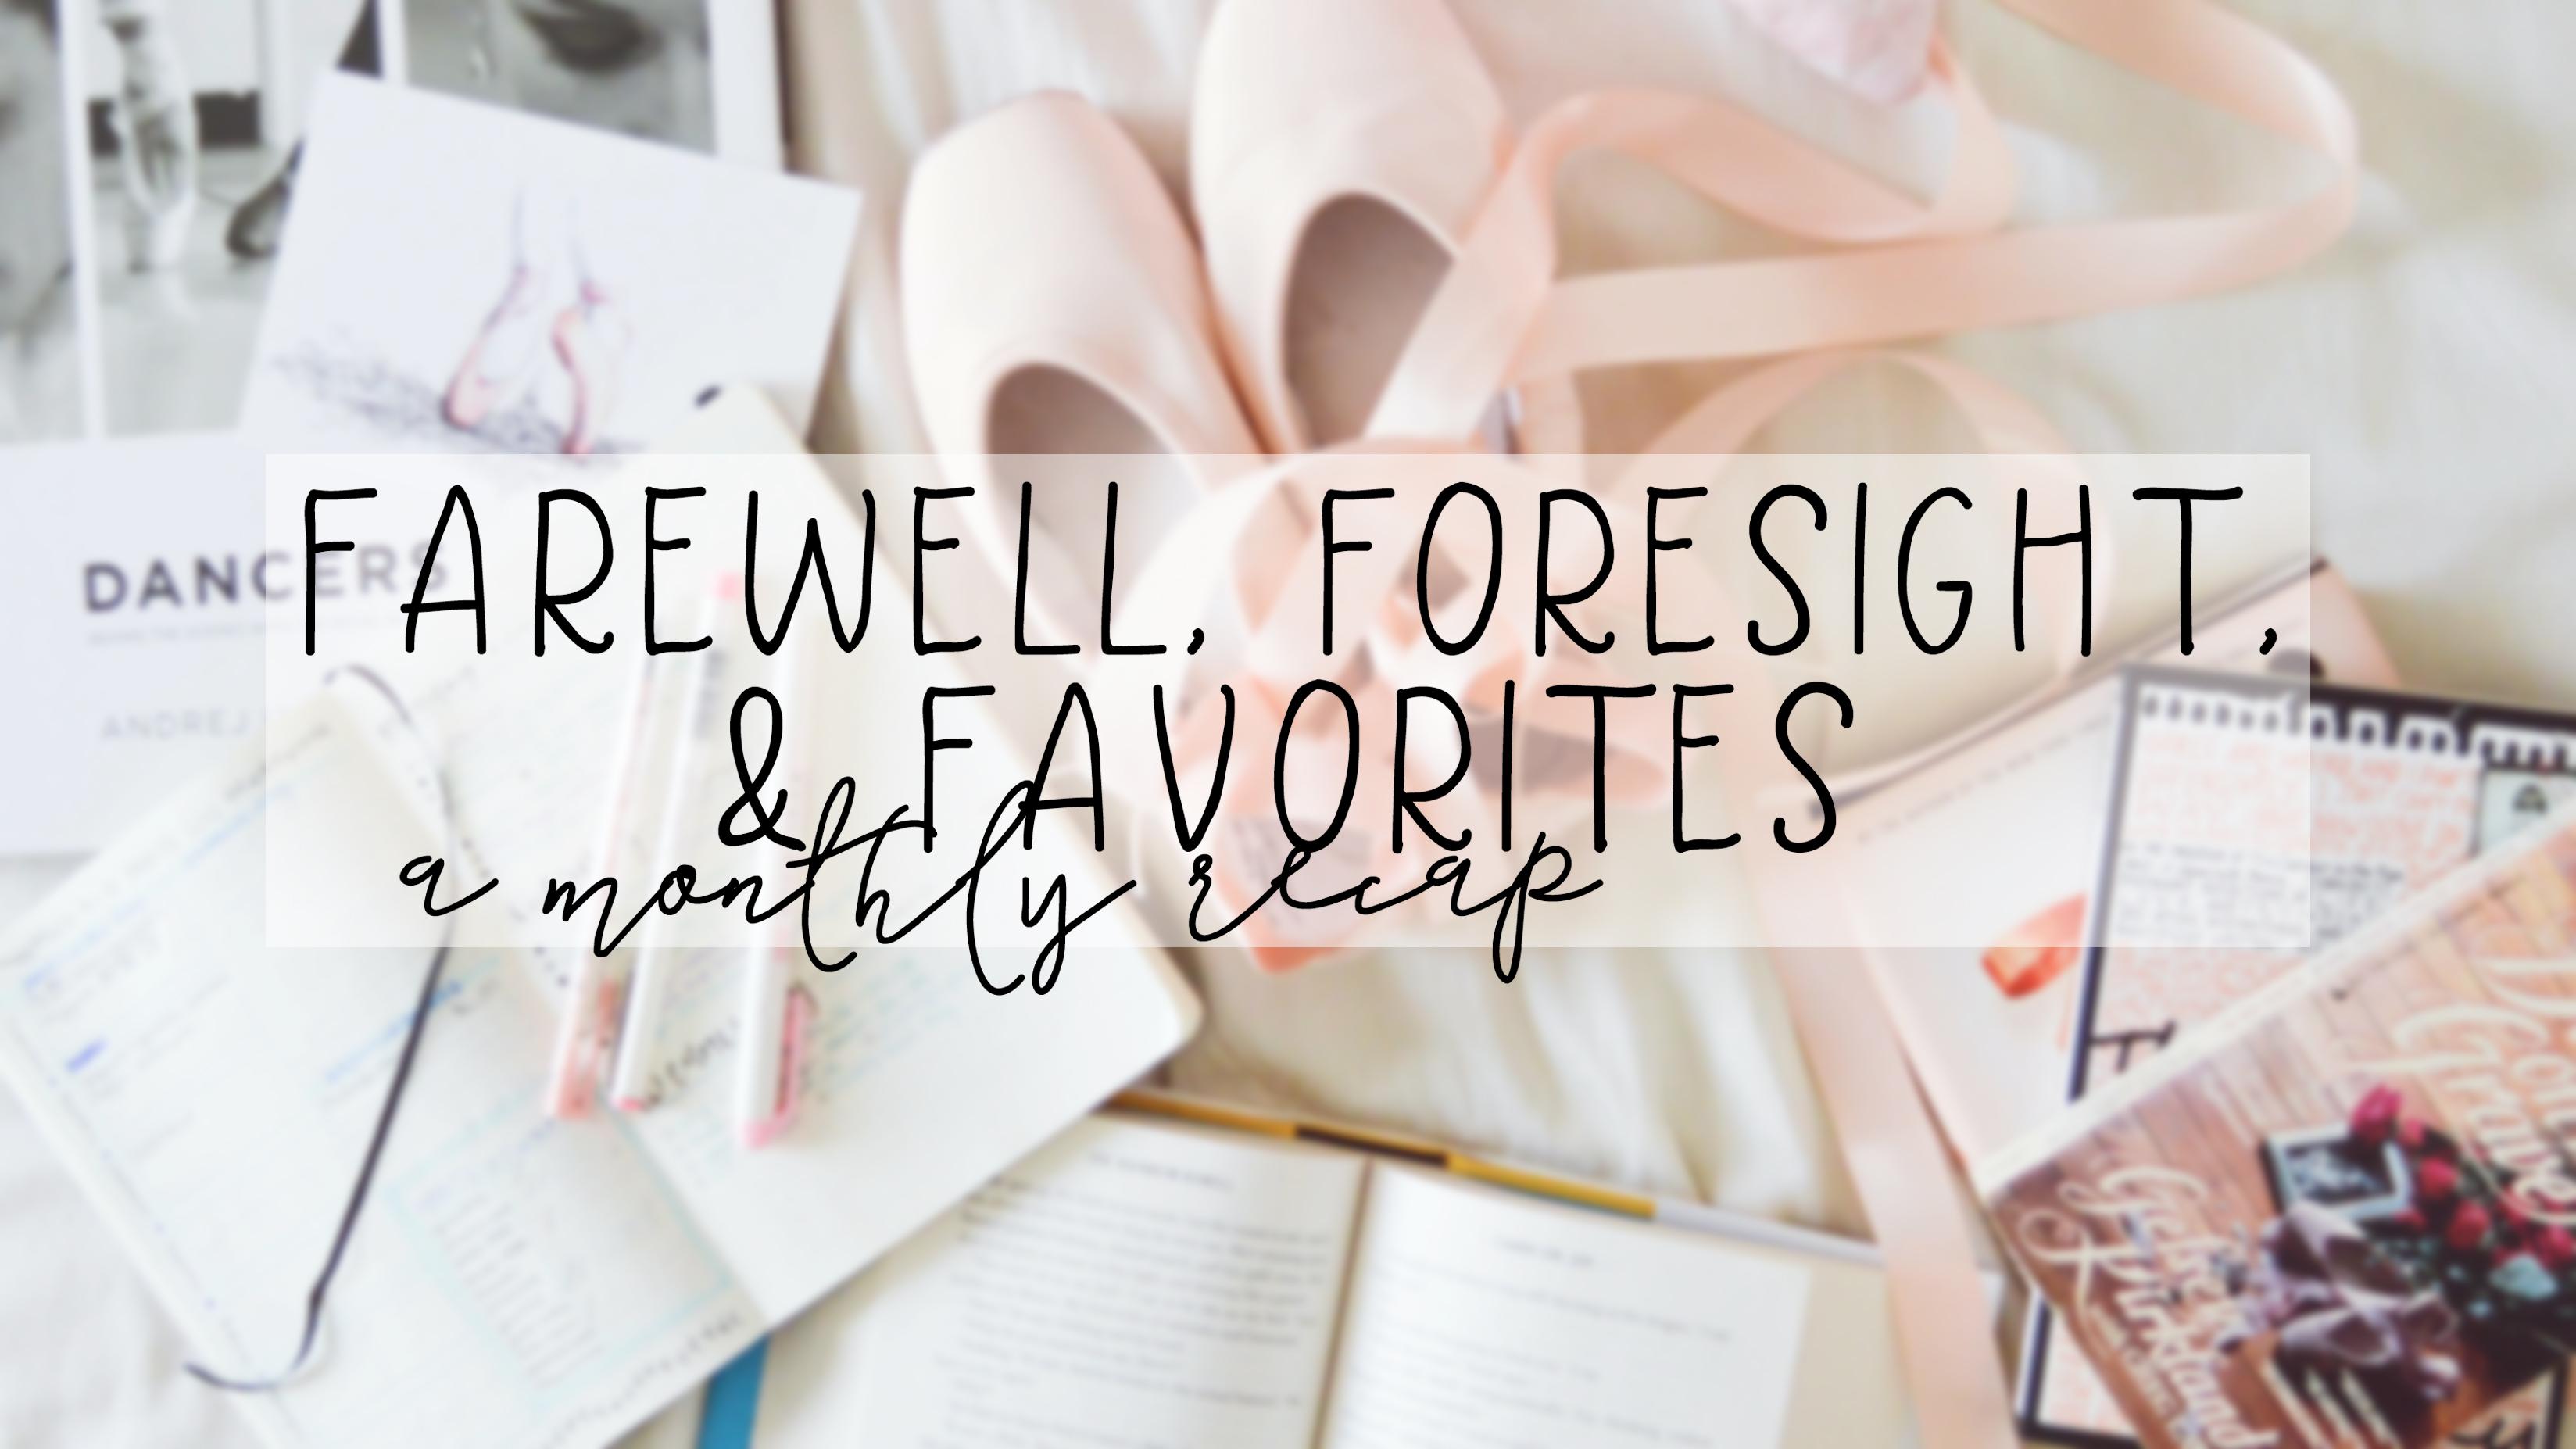 farewell, foresight, favorites